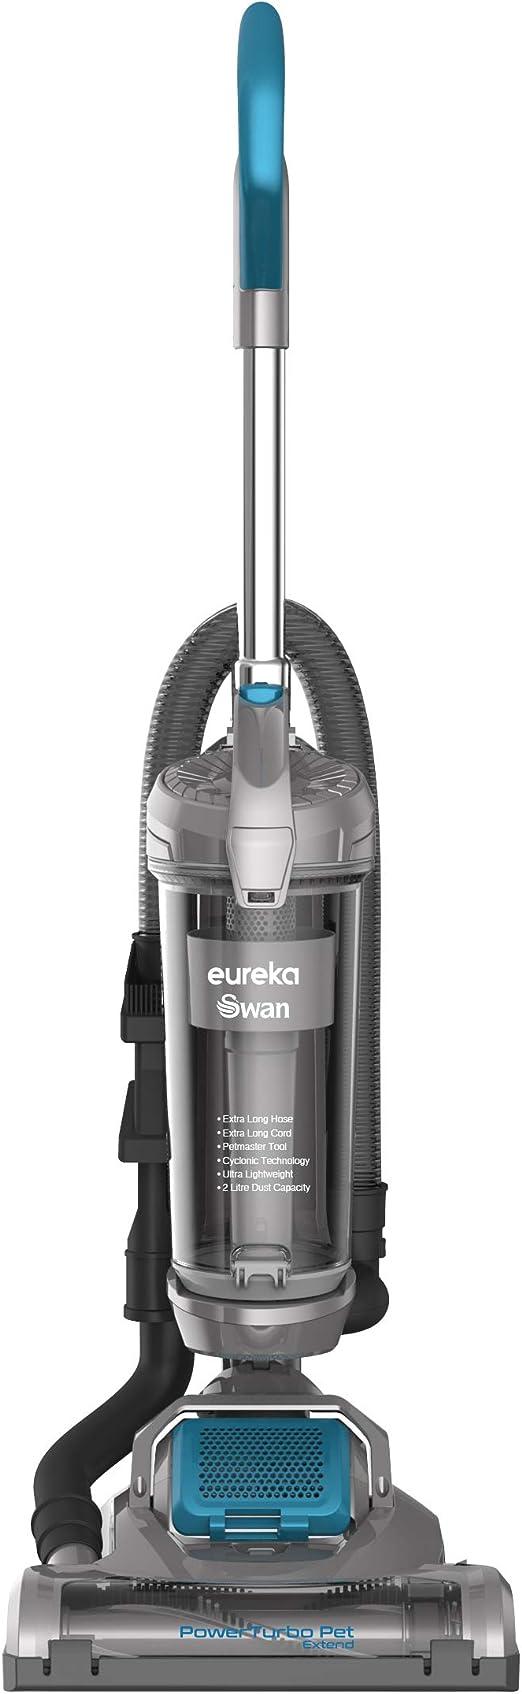 Swan TurboPower Pet Extend Upright Vacuum, Ultra Lightweight, 3L Capacity, 400 Motor, 9.3m Power Cord, 2m Hose, Detachable Handle, Energy Class A++,